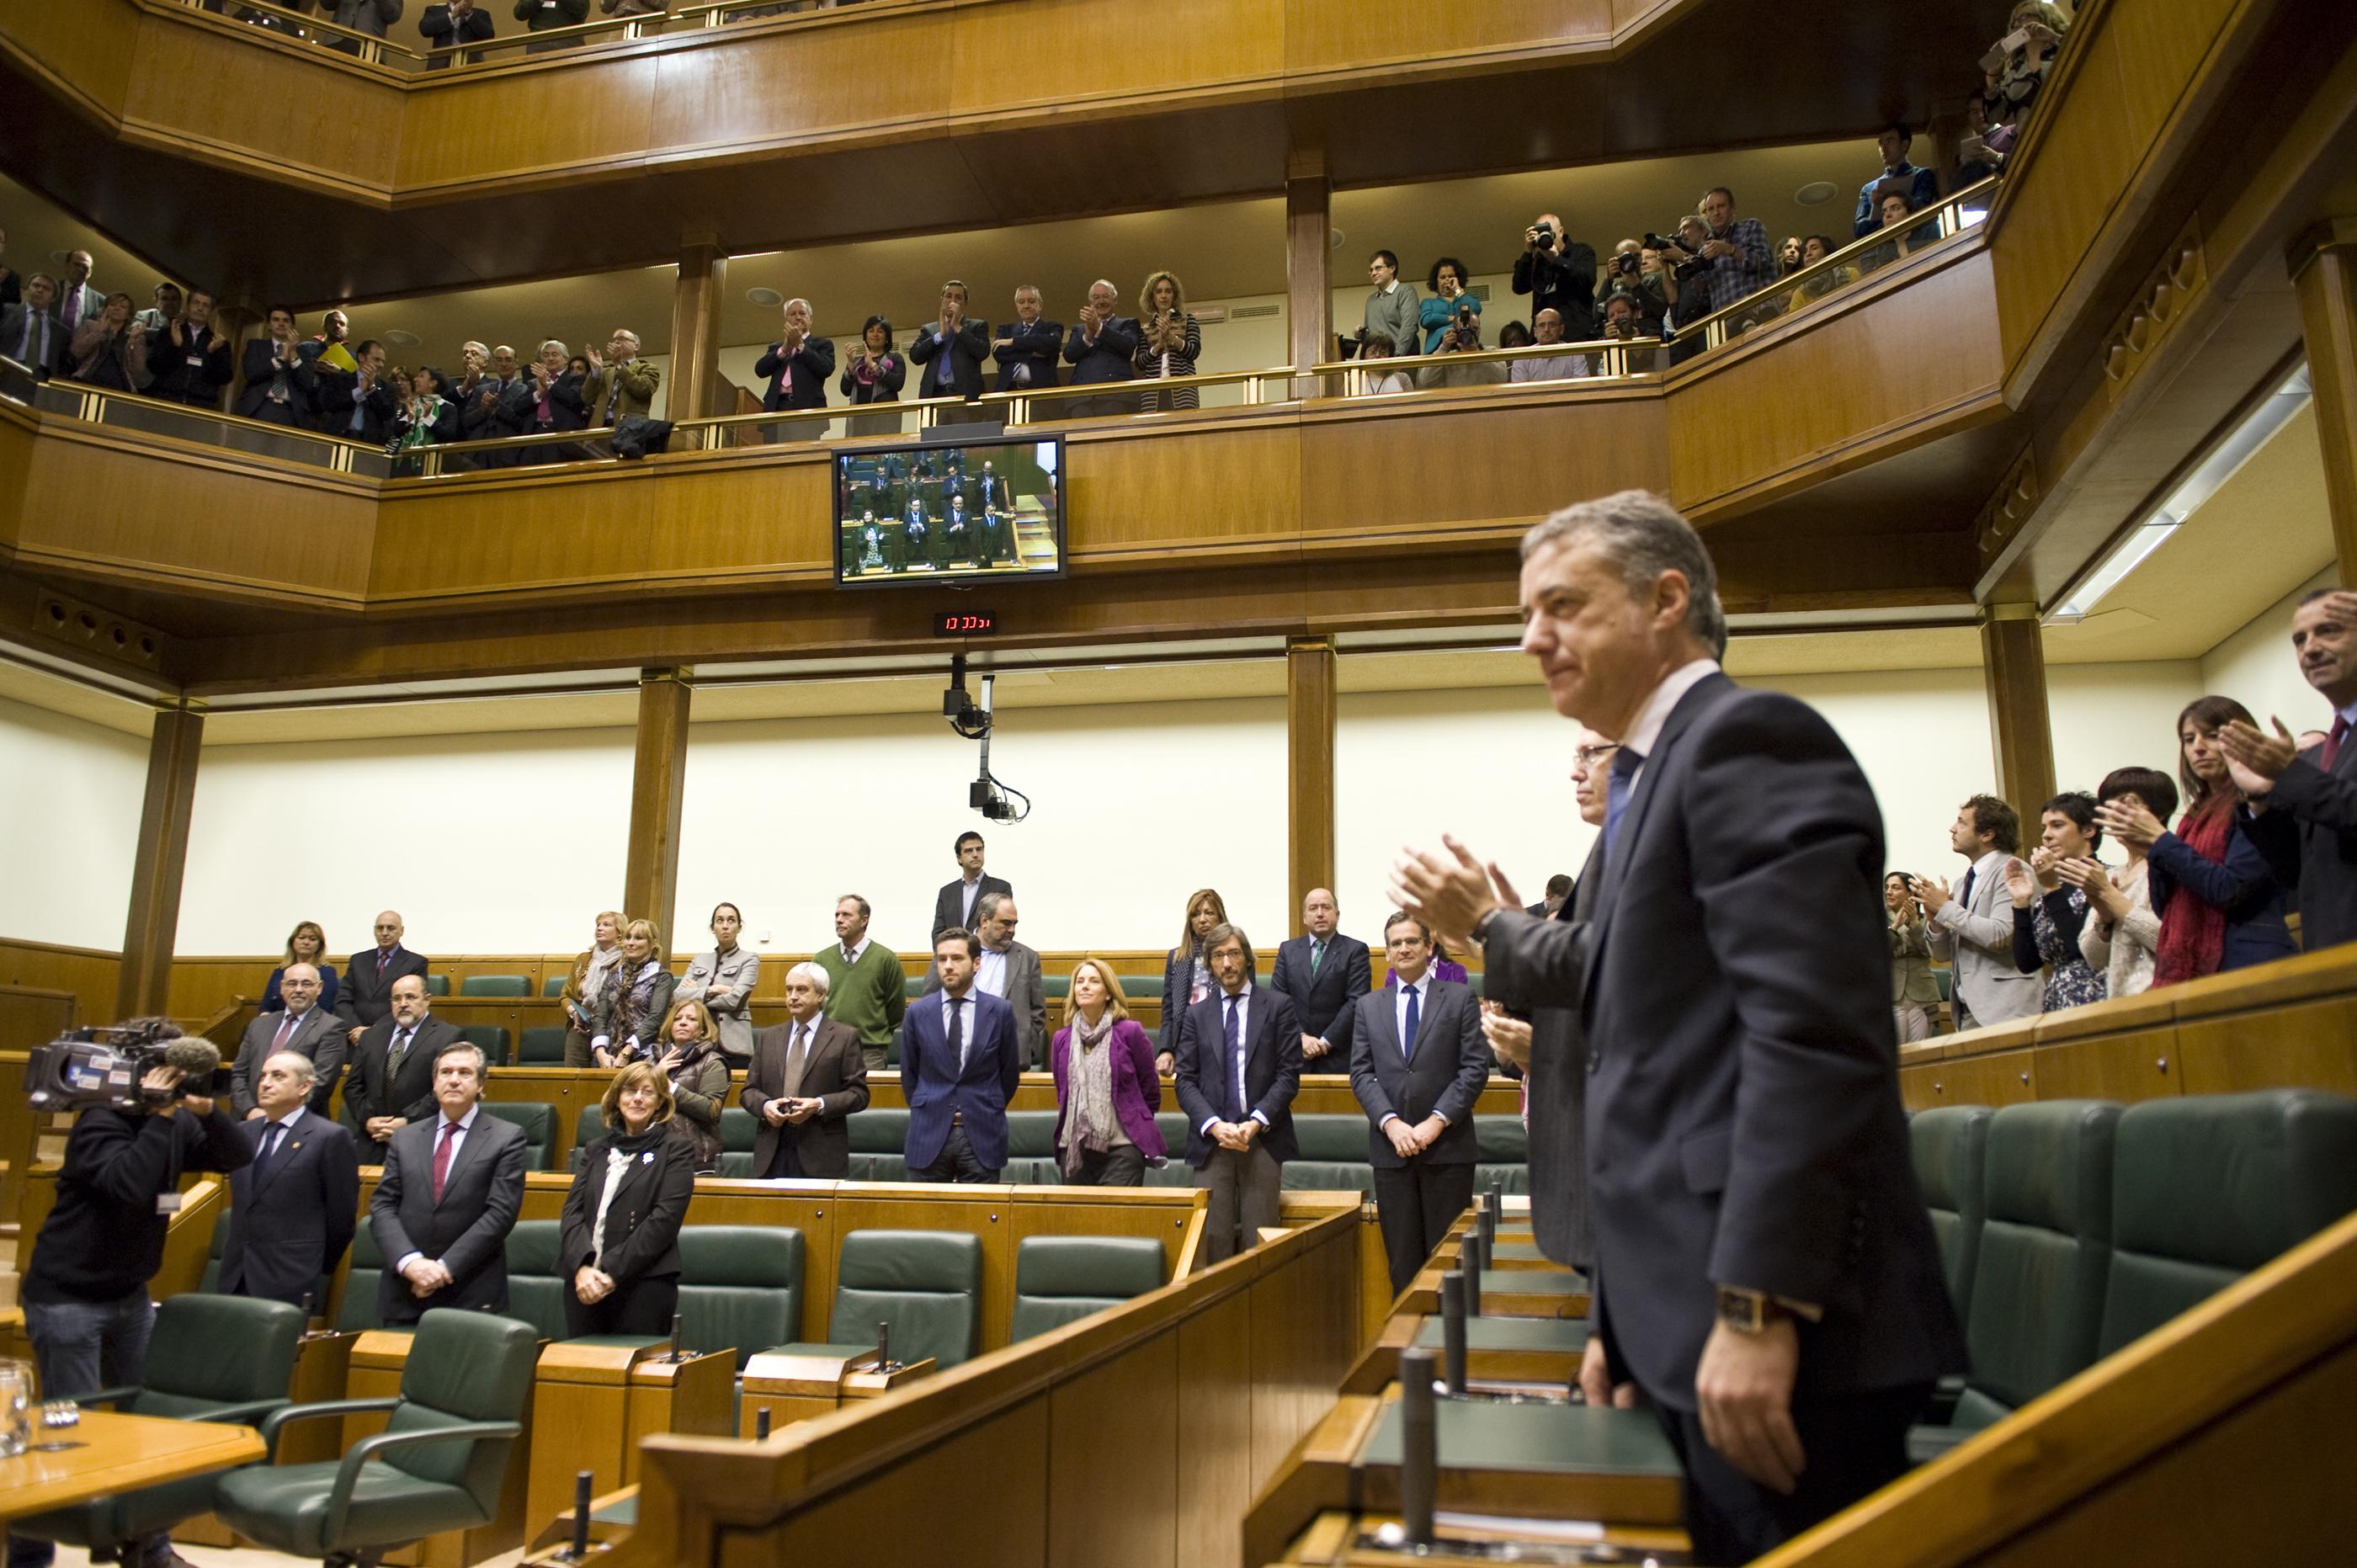 2012_12_13_lehen_parlamento_646.jpg